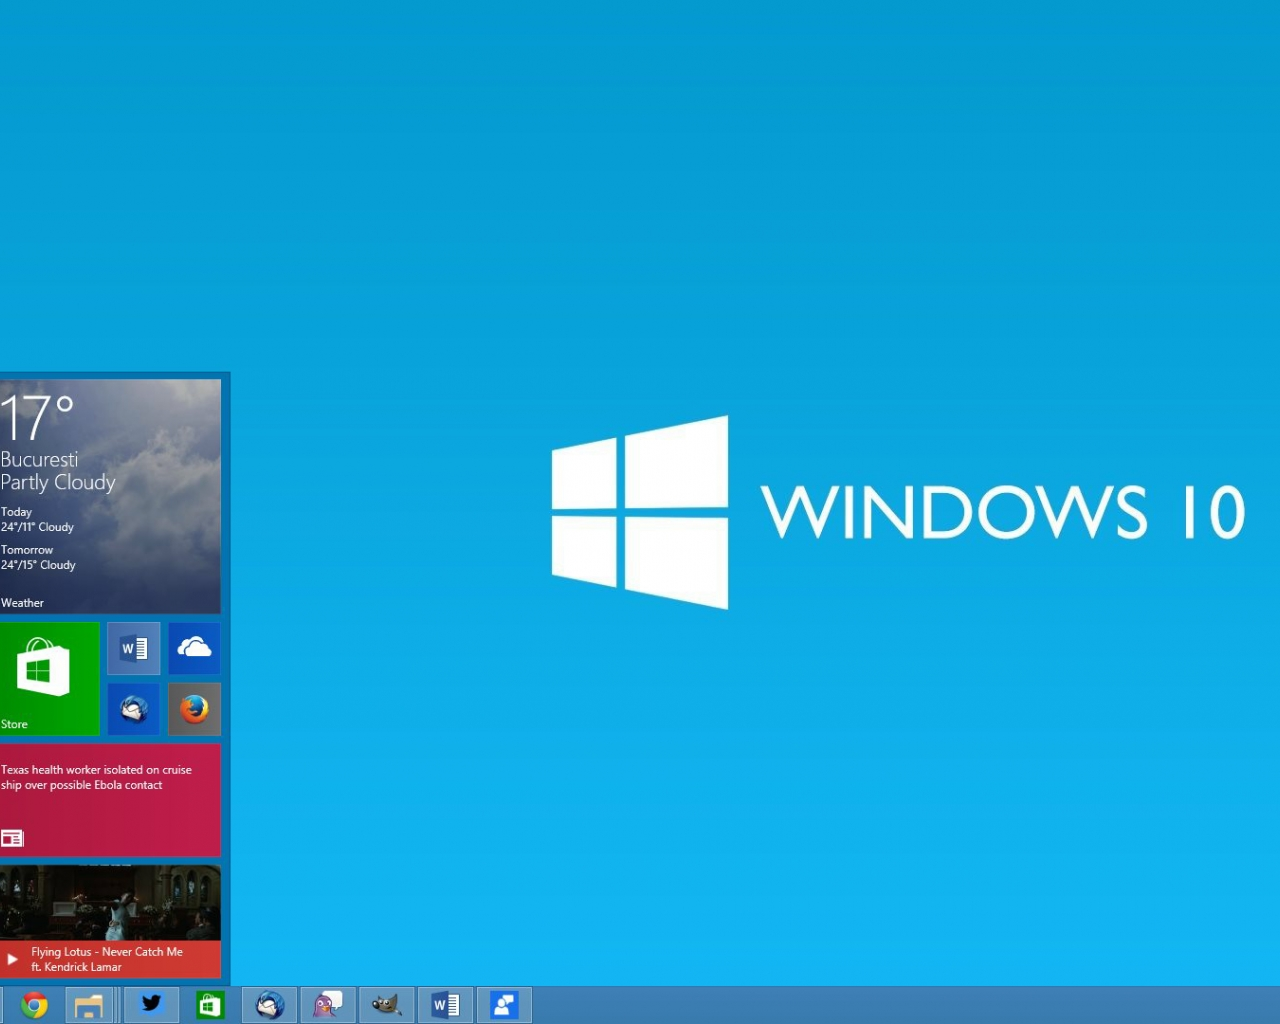 download Windows 10 Microsoft Operating System fake desktop 1280x1024